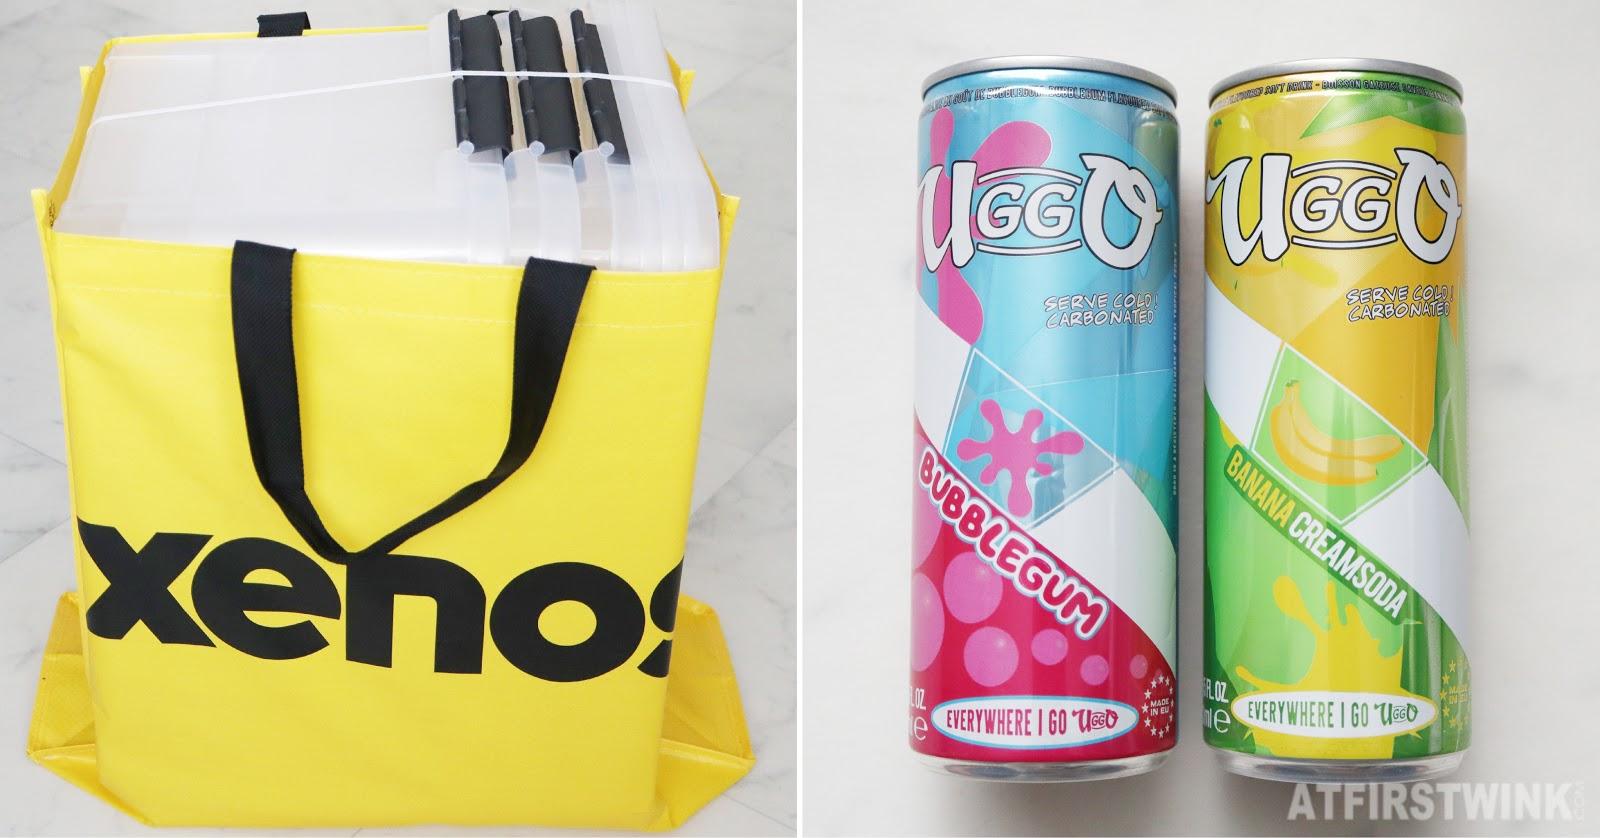 Xenos Rotterdam yellow shopper storage boxes uggo bubblegum banana cream soda